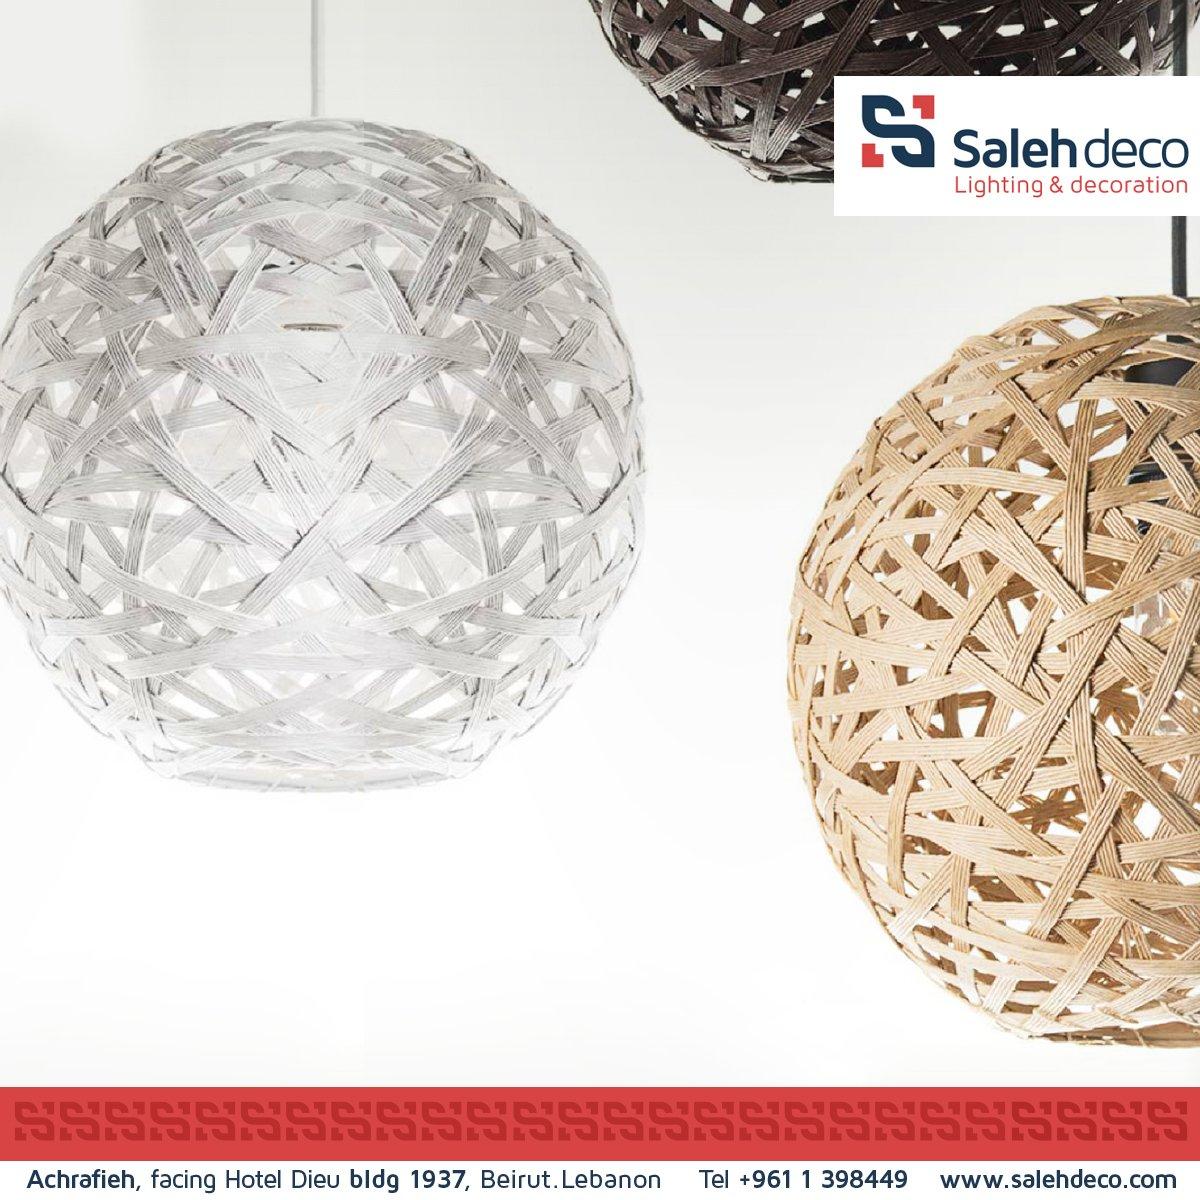 Available soon at Saleh Deco  #lighting #design #interior #modern #homedeco #decor #salehdeco #deco Tel:01398449 https://t.co/e2kpj4c66S